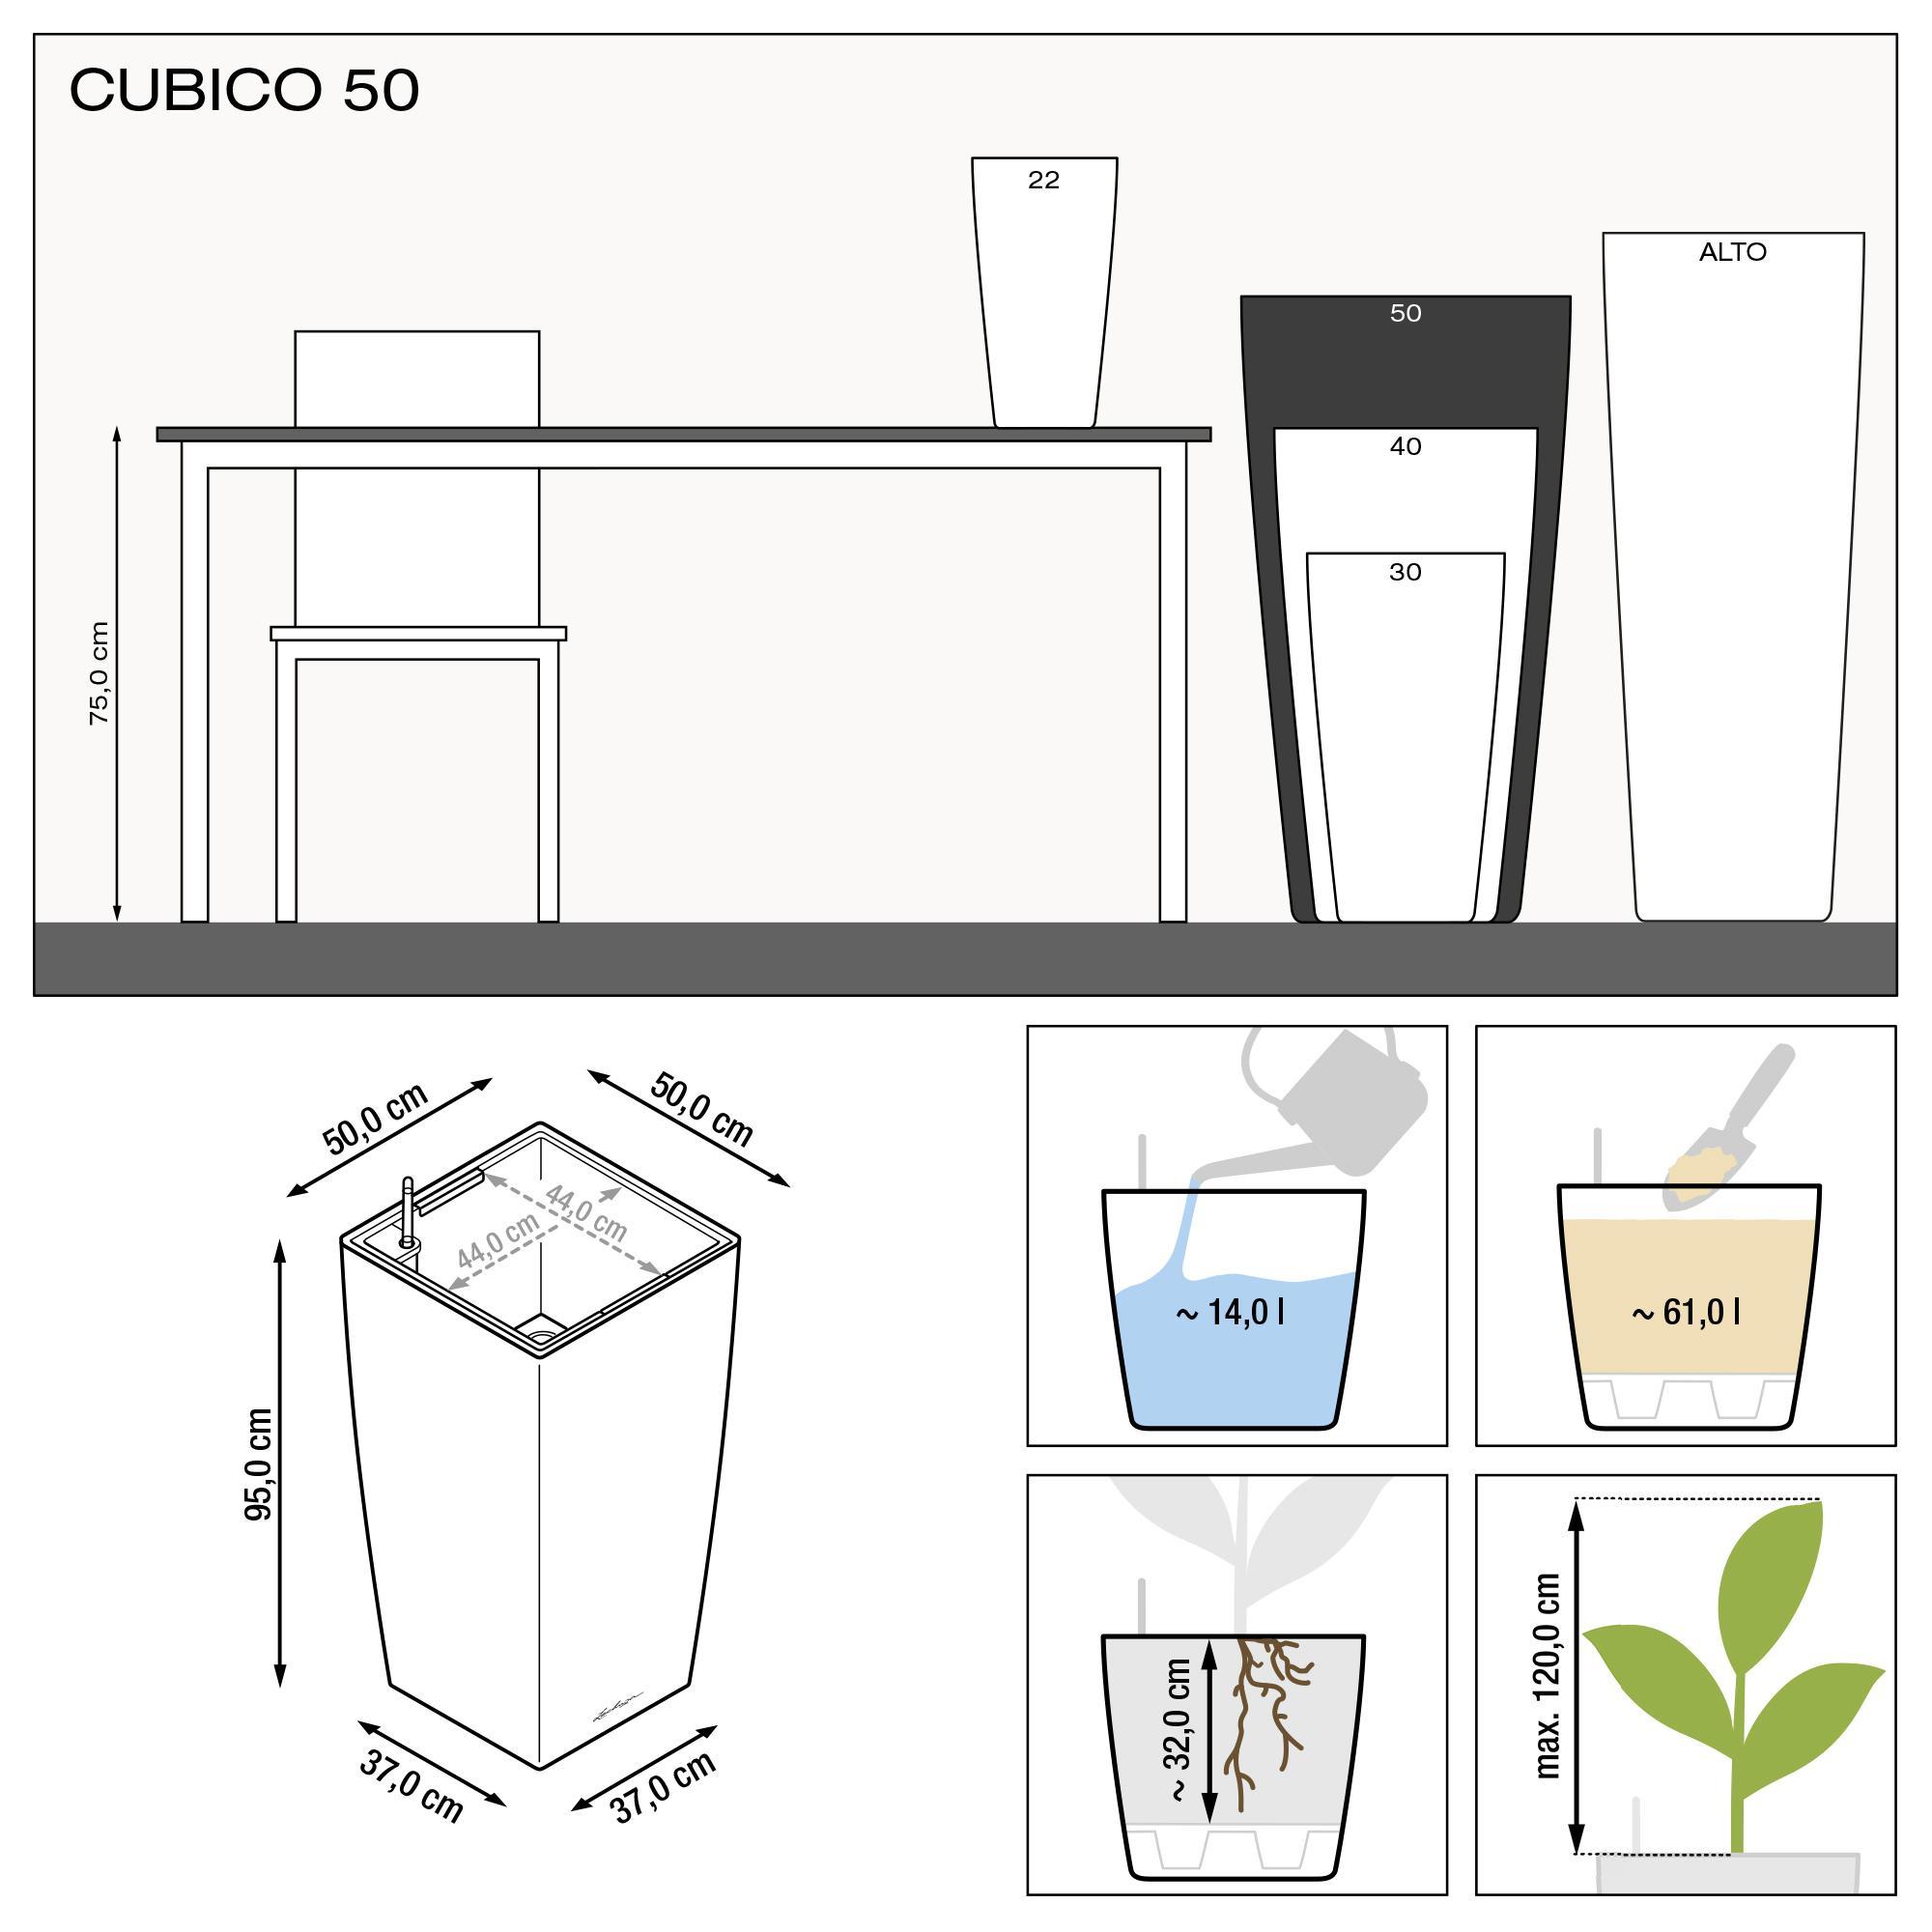 le_cubico50_product_addi_nz